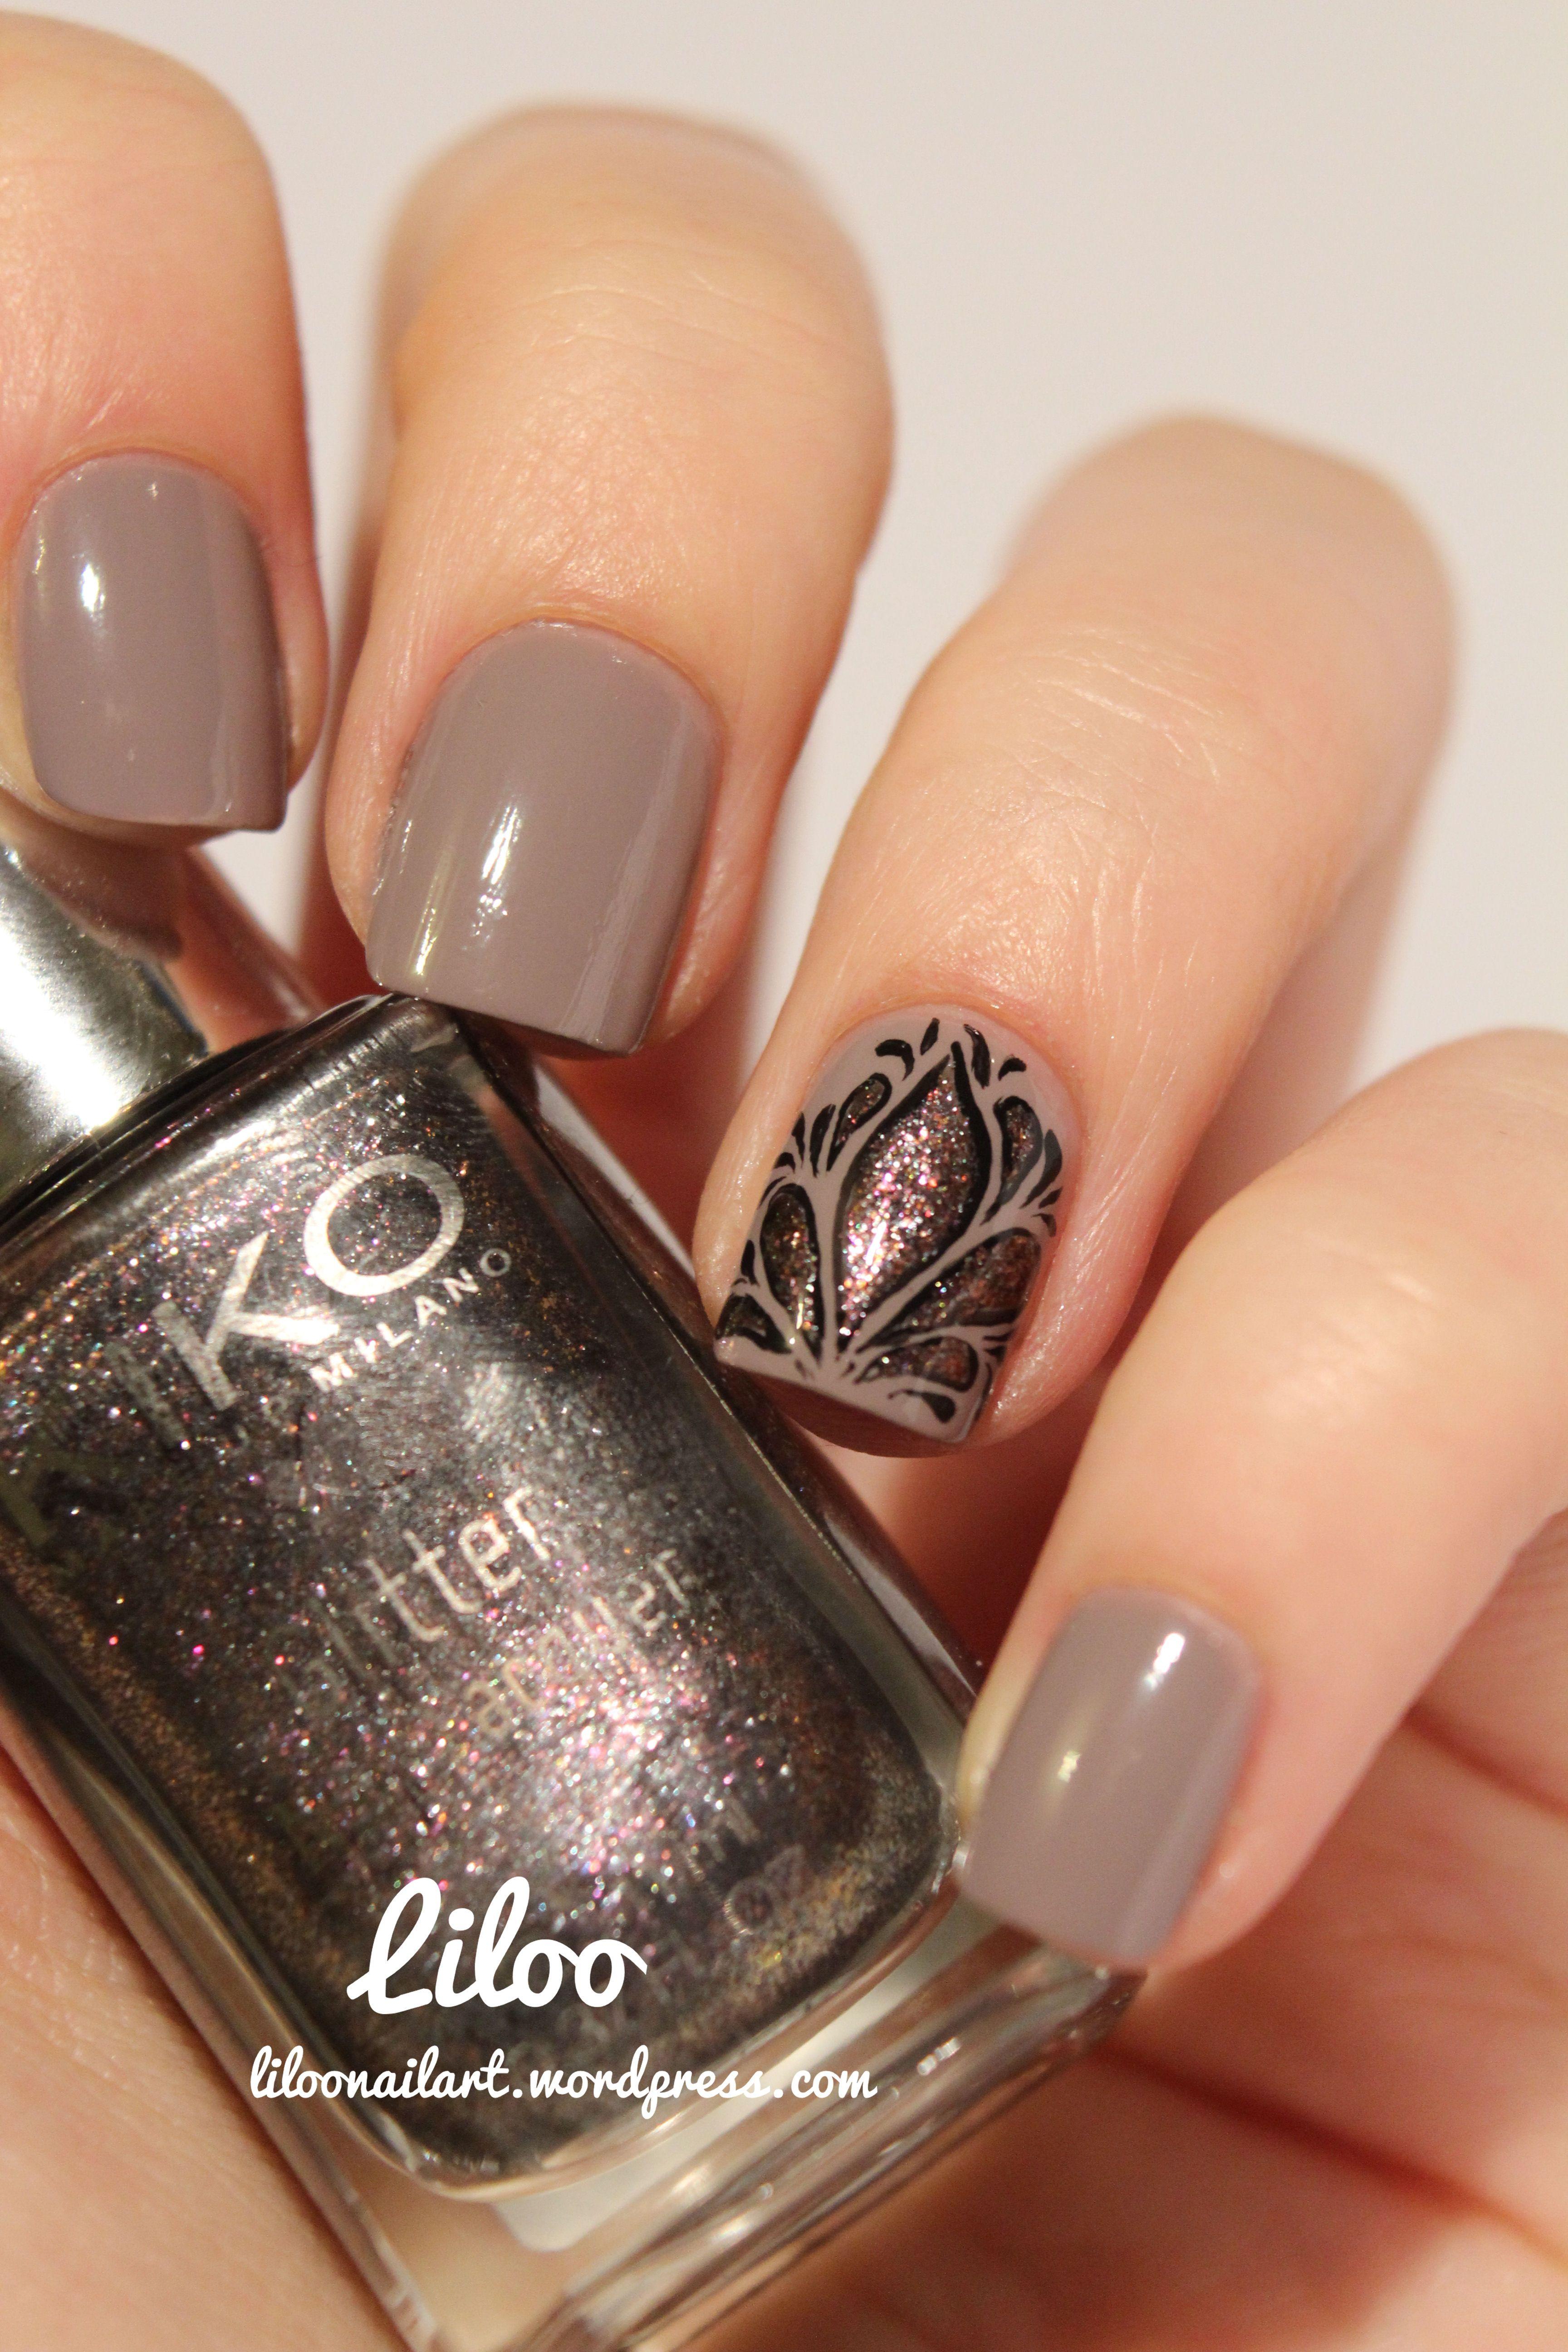 Accent nail kiko nails accent nails and glitter accent nail kiko prinsesfo Gallery